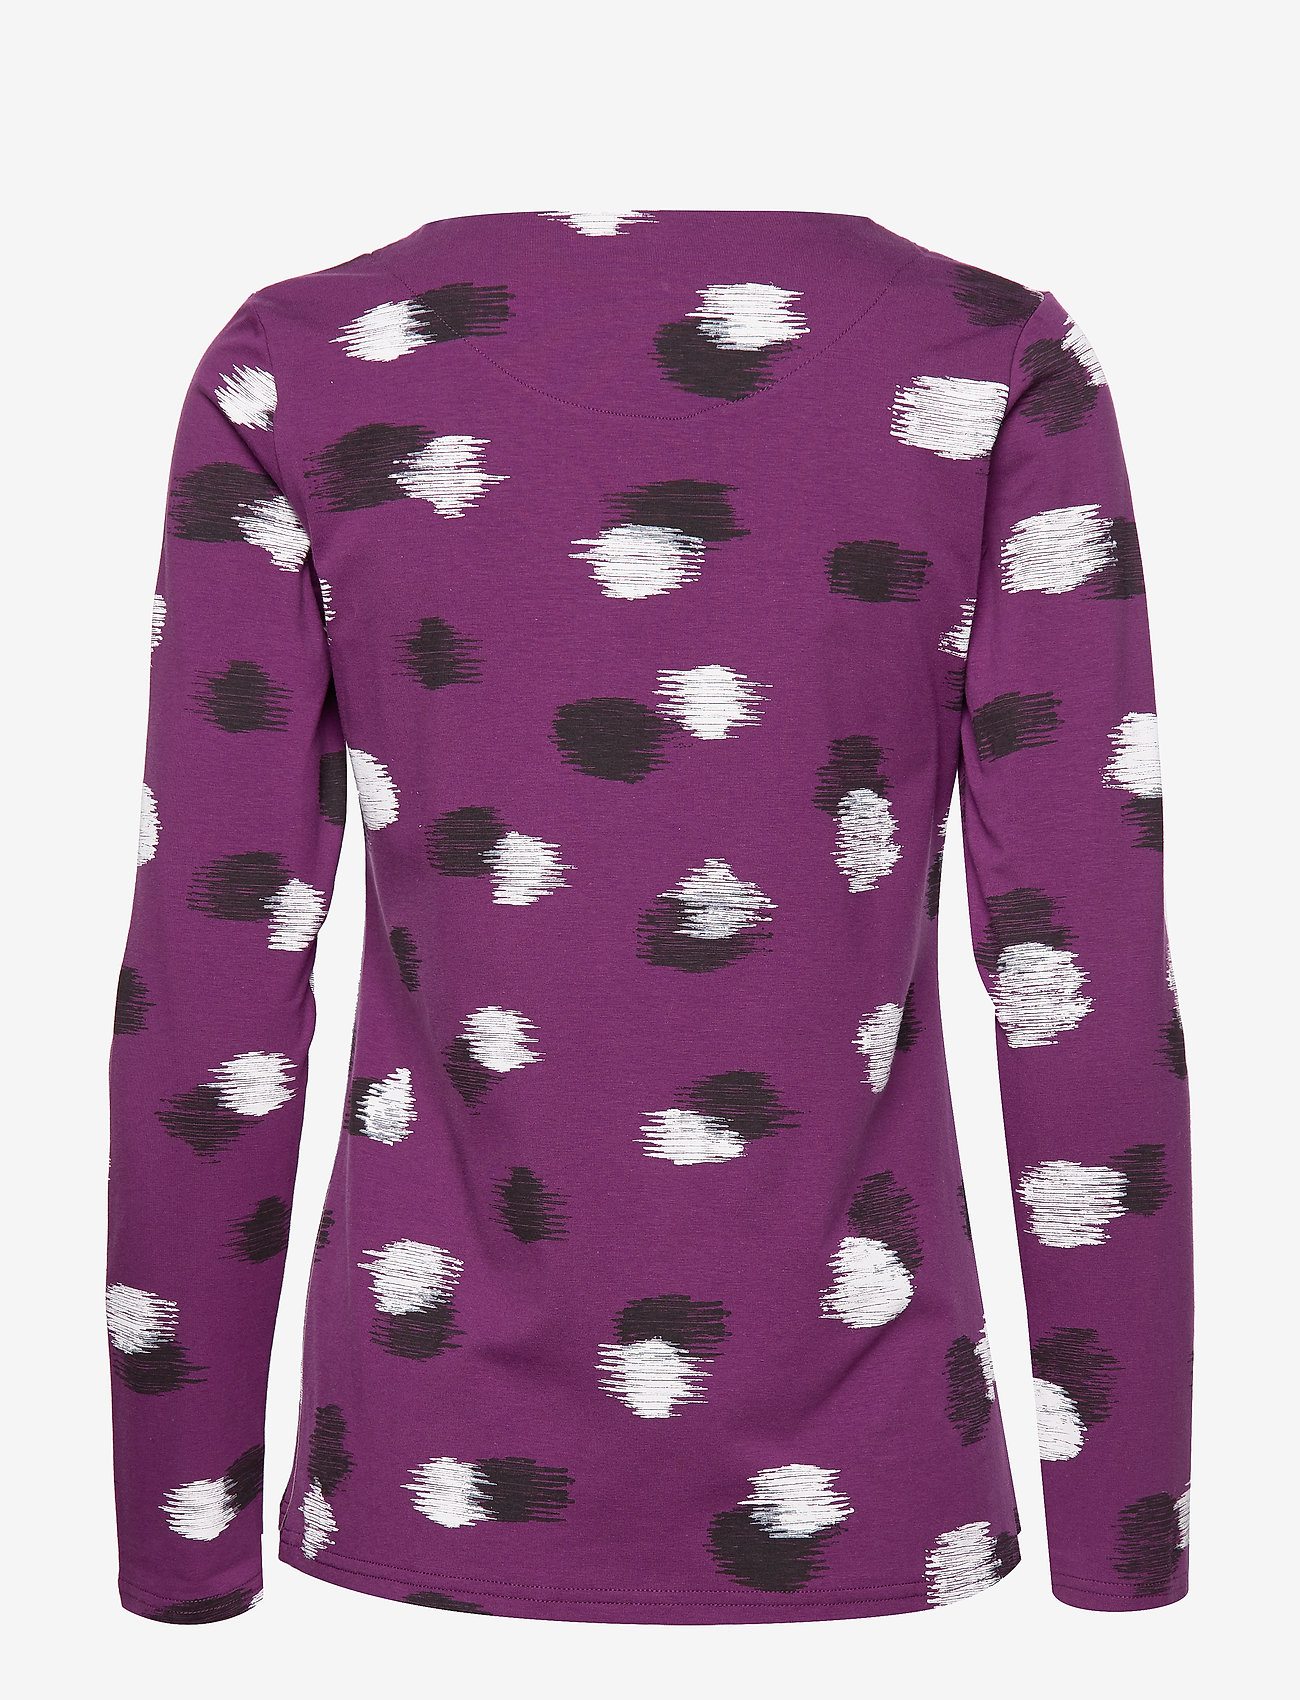 Nanso - Ladies blouse, Kastanja - pitkähihaiset t-paidat - purple - 1